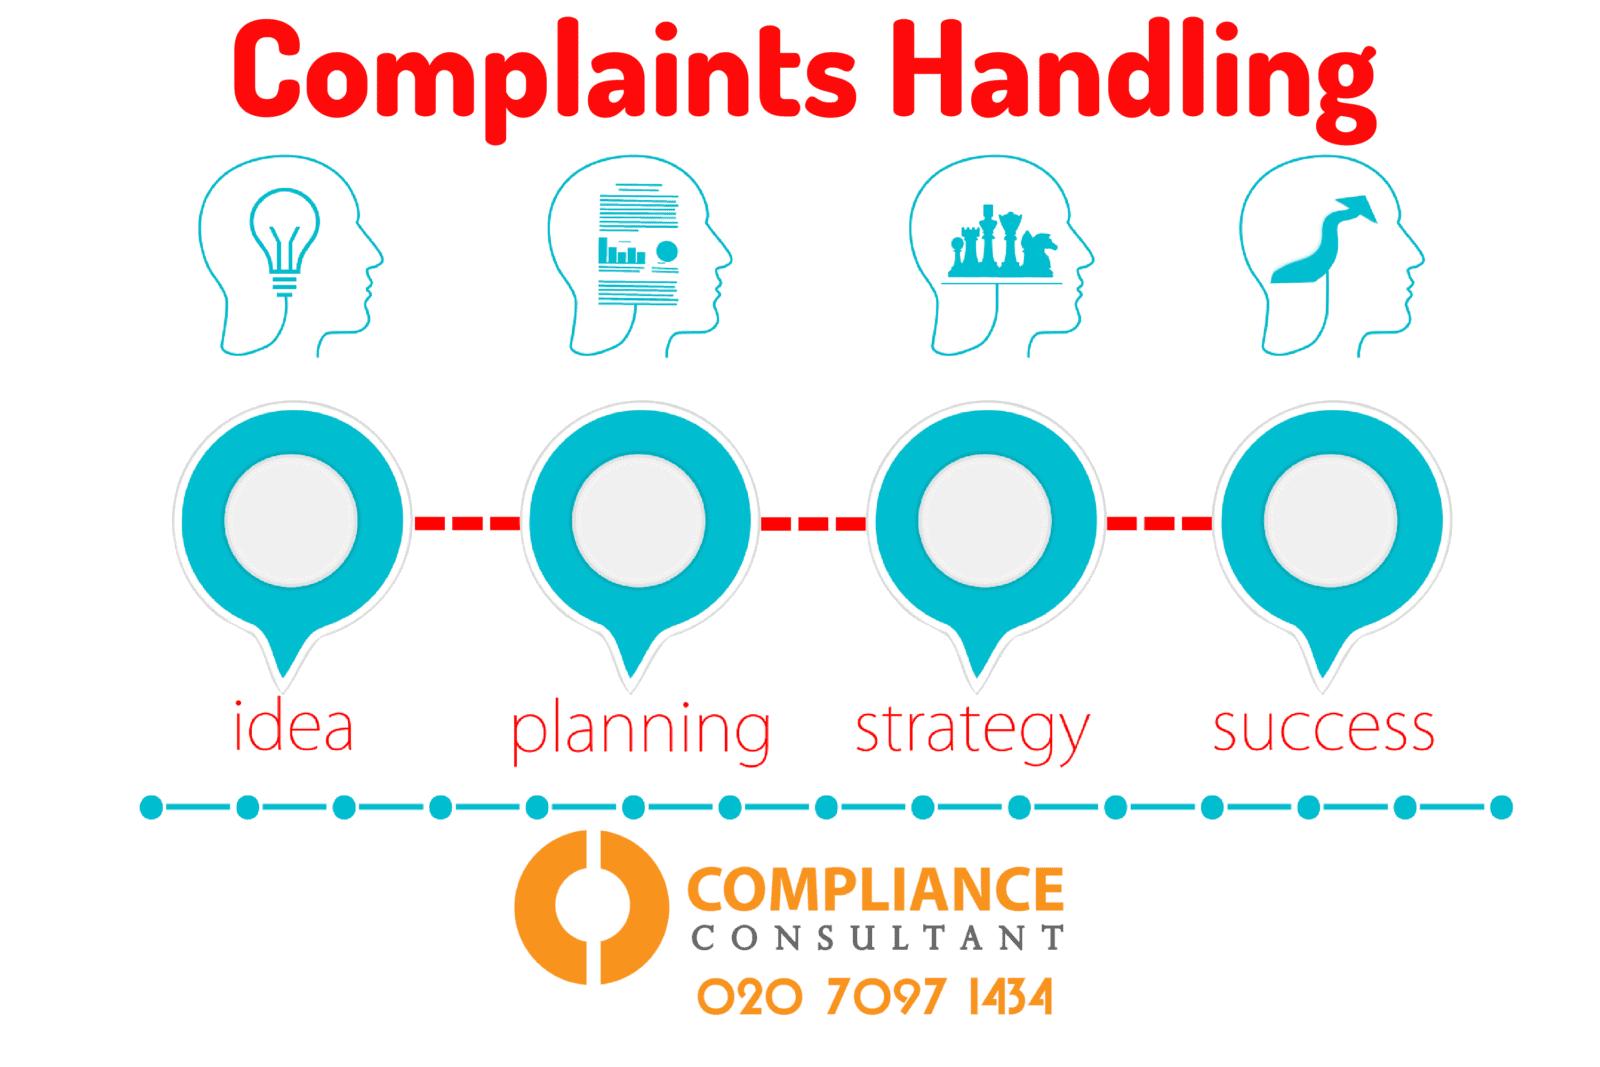 regulatory complaints handling image